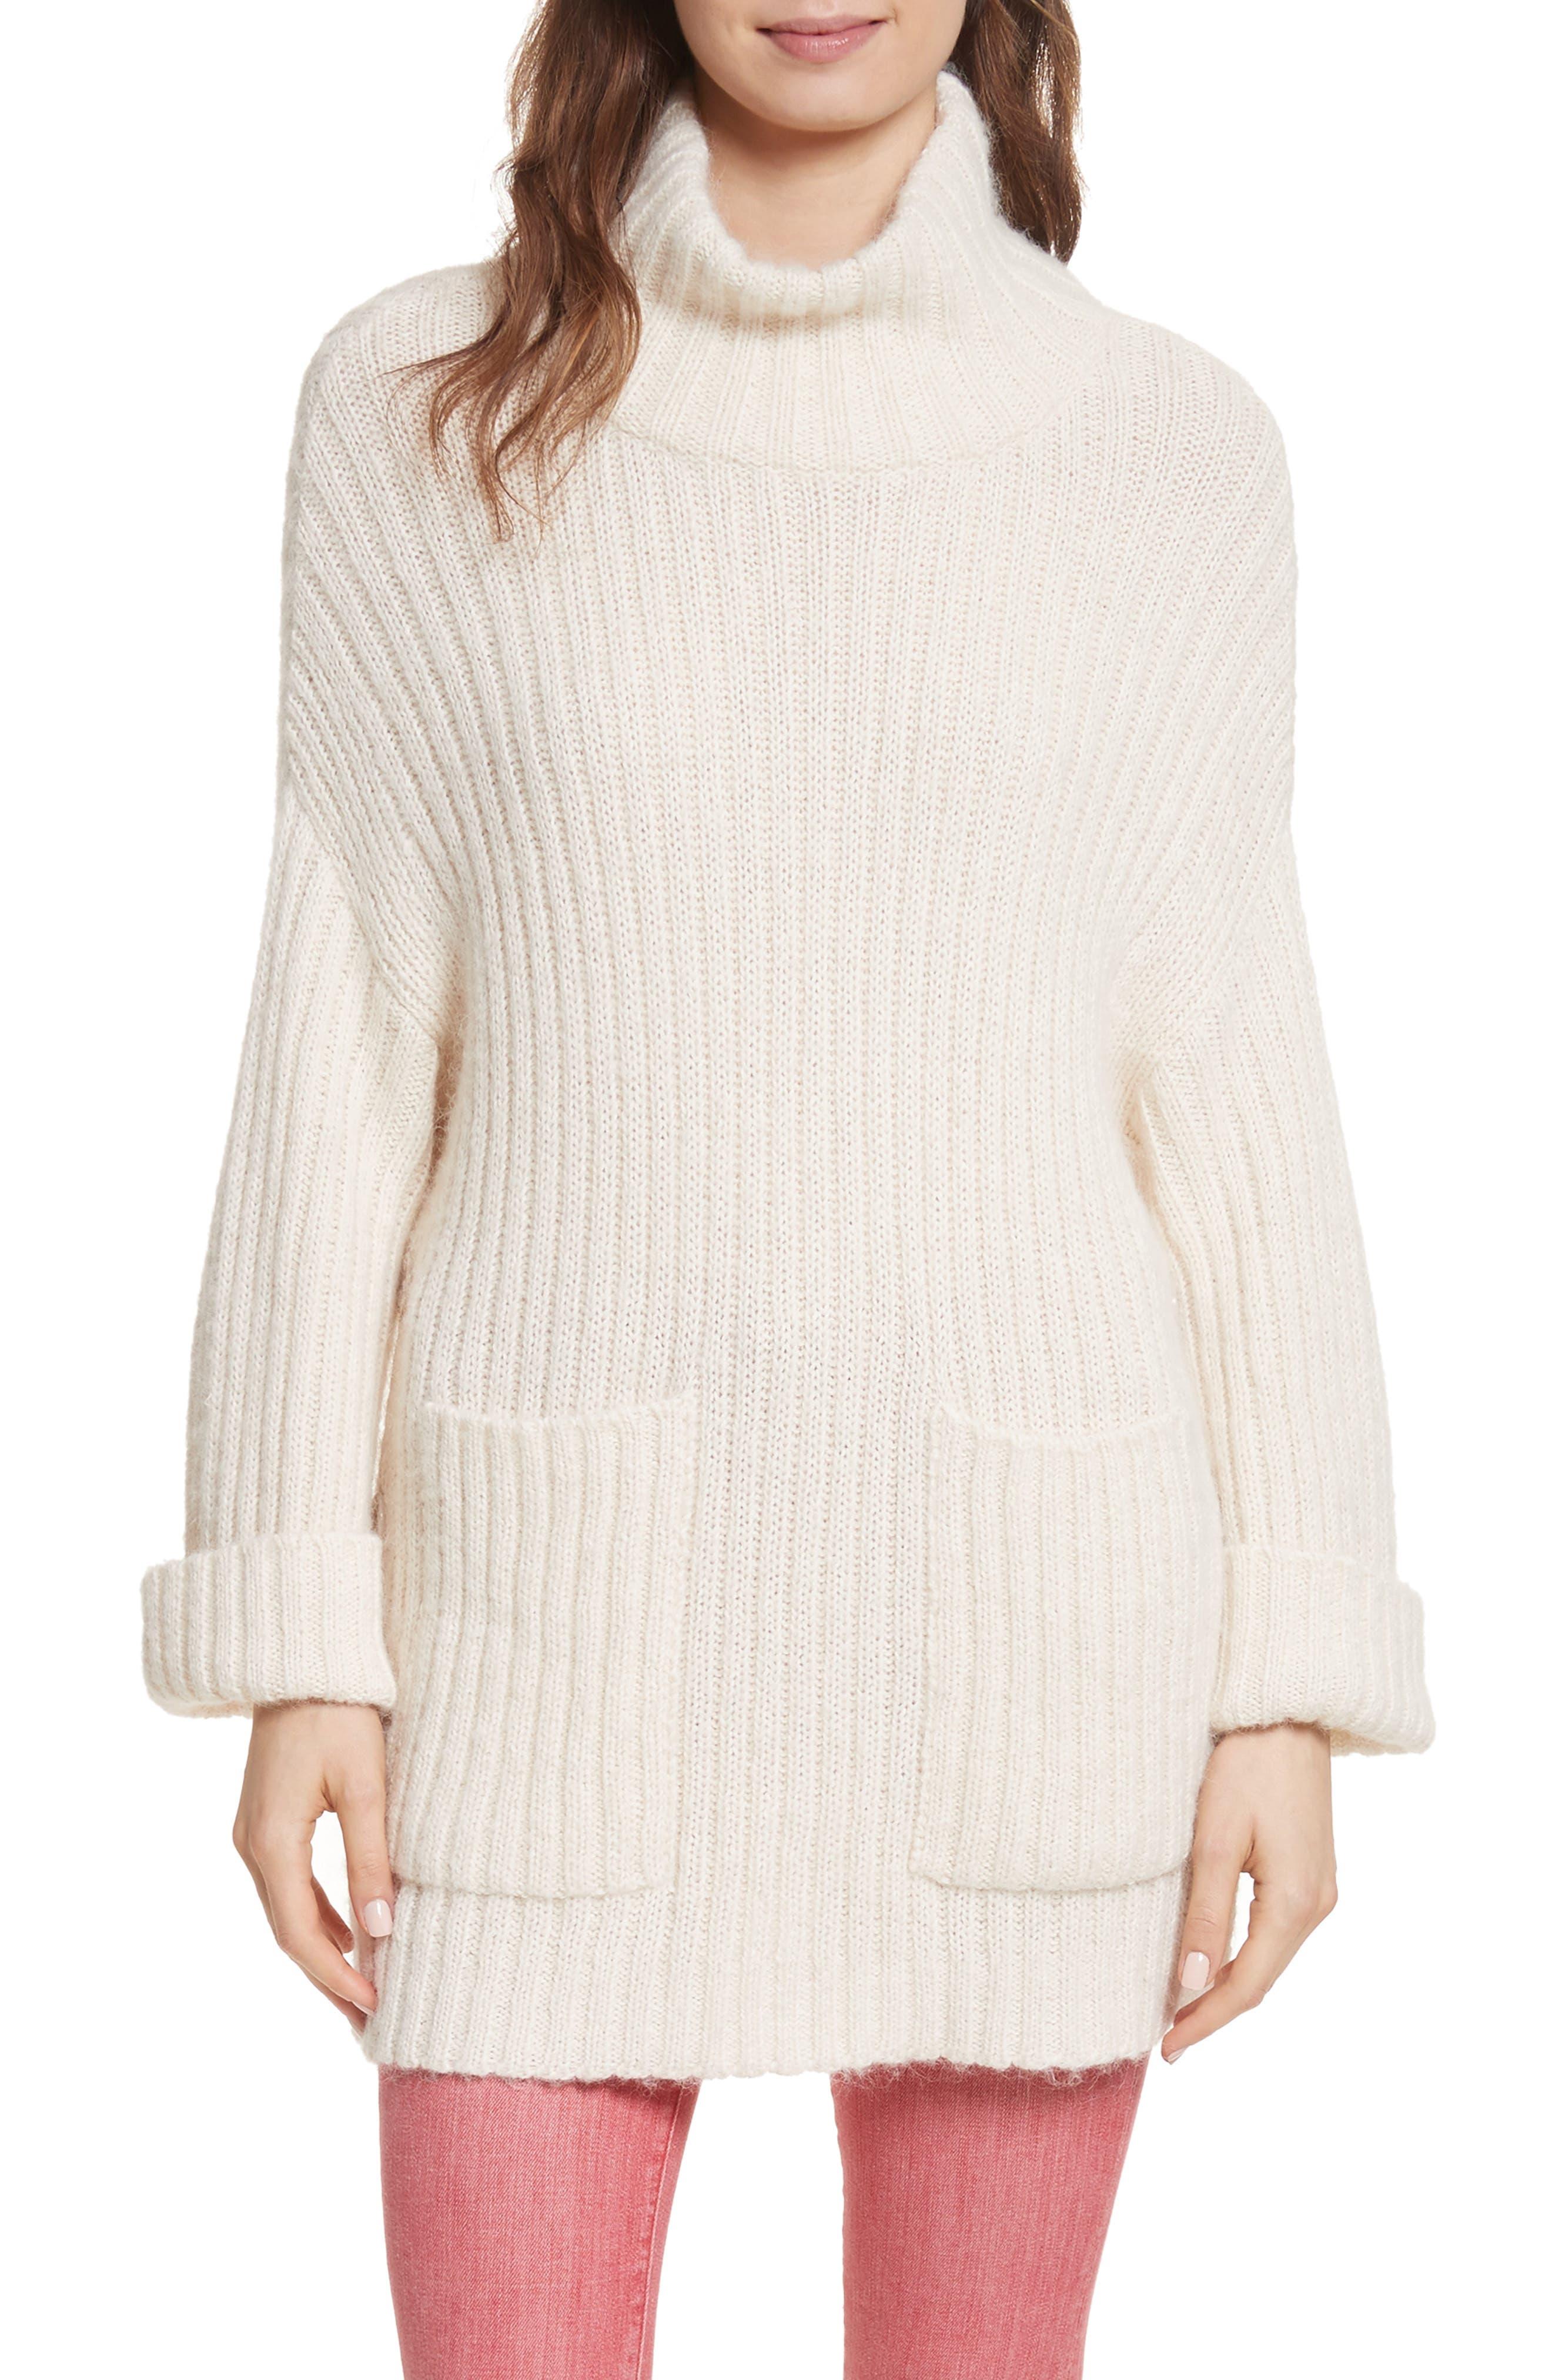 Banain Turtleneck Sweater,                         Main,                         color, Porcelain